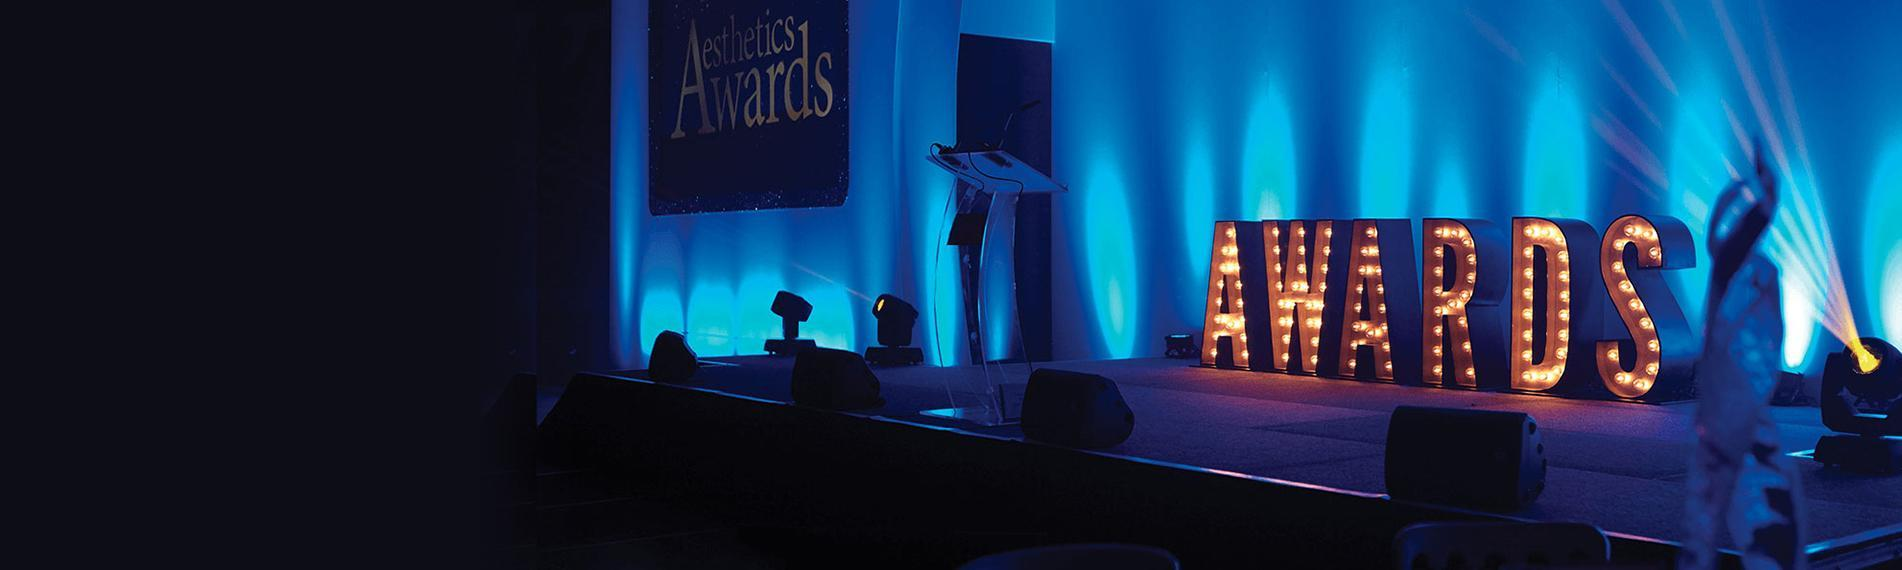 sw-aesthetics-awards